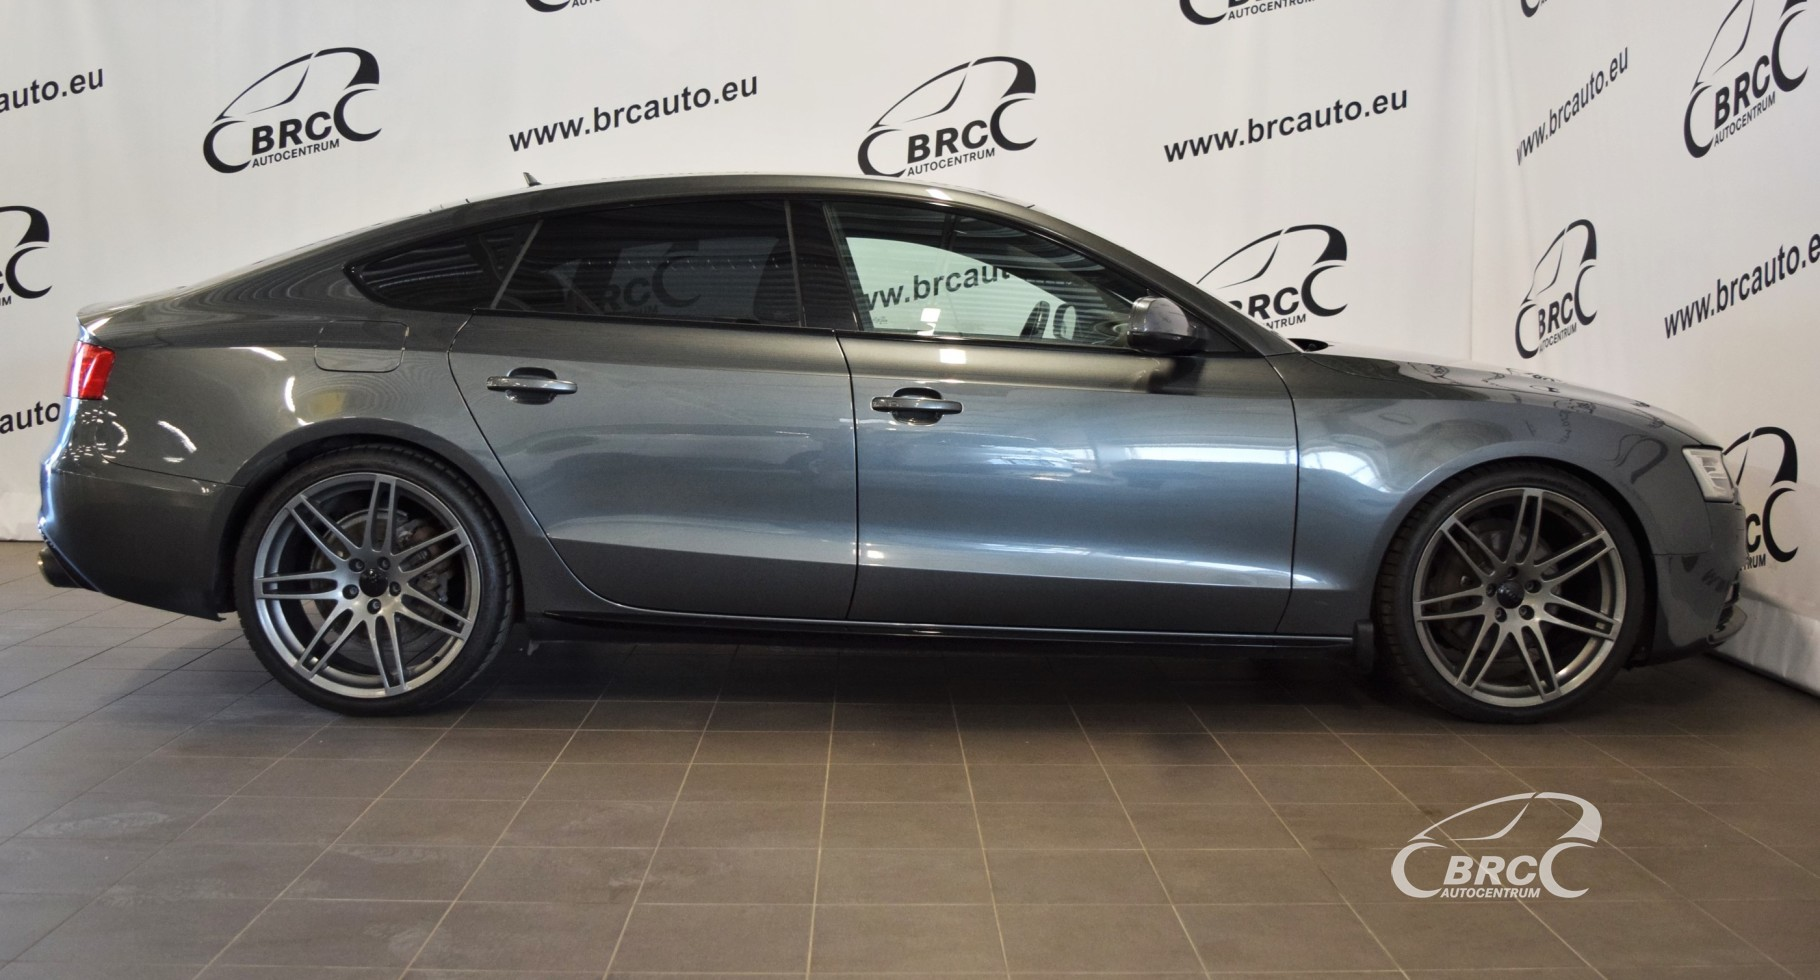 Audi A5 Sportback Quattro